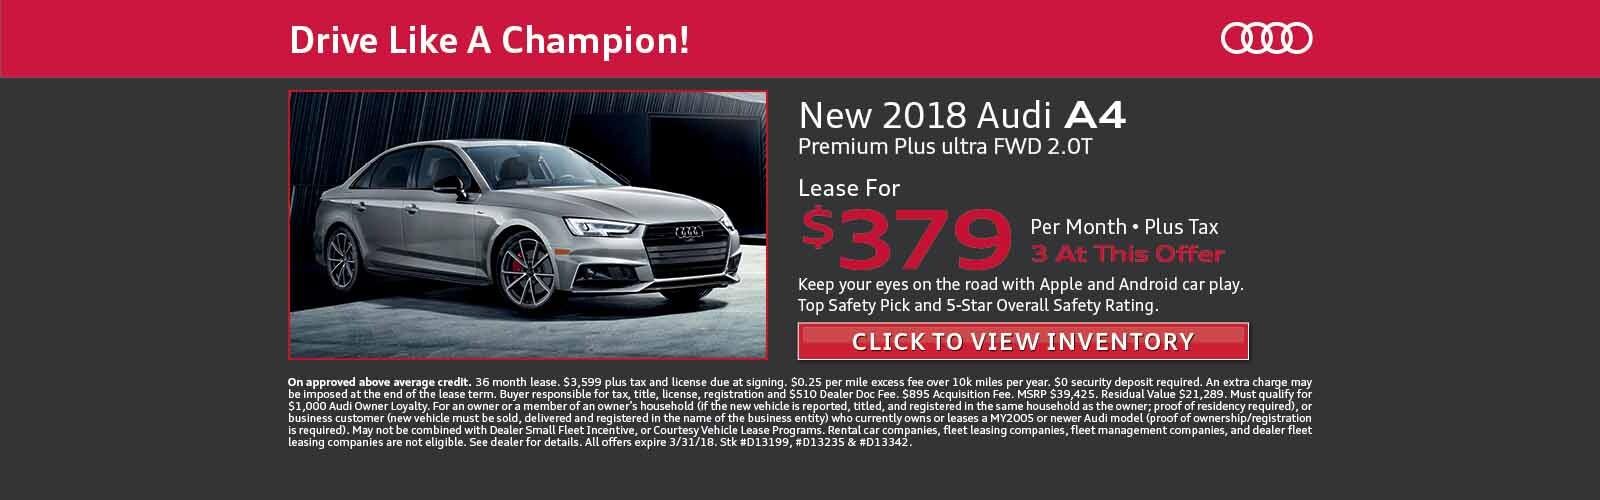 New Audi Used Audi Cars In Phoenix AZ Audi North - Audi car lot